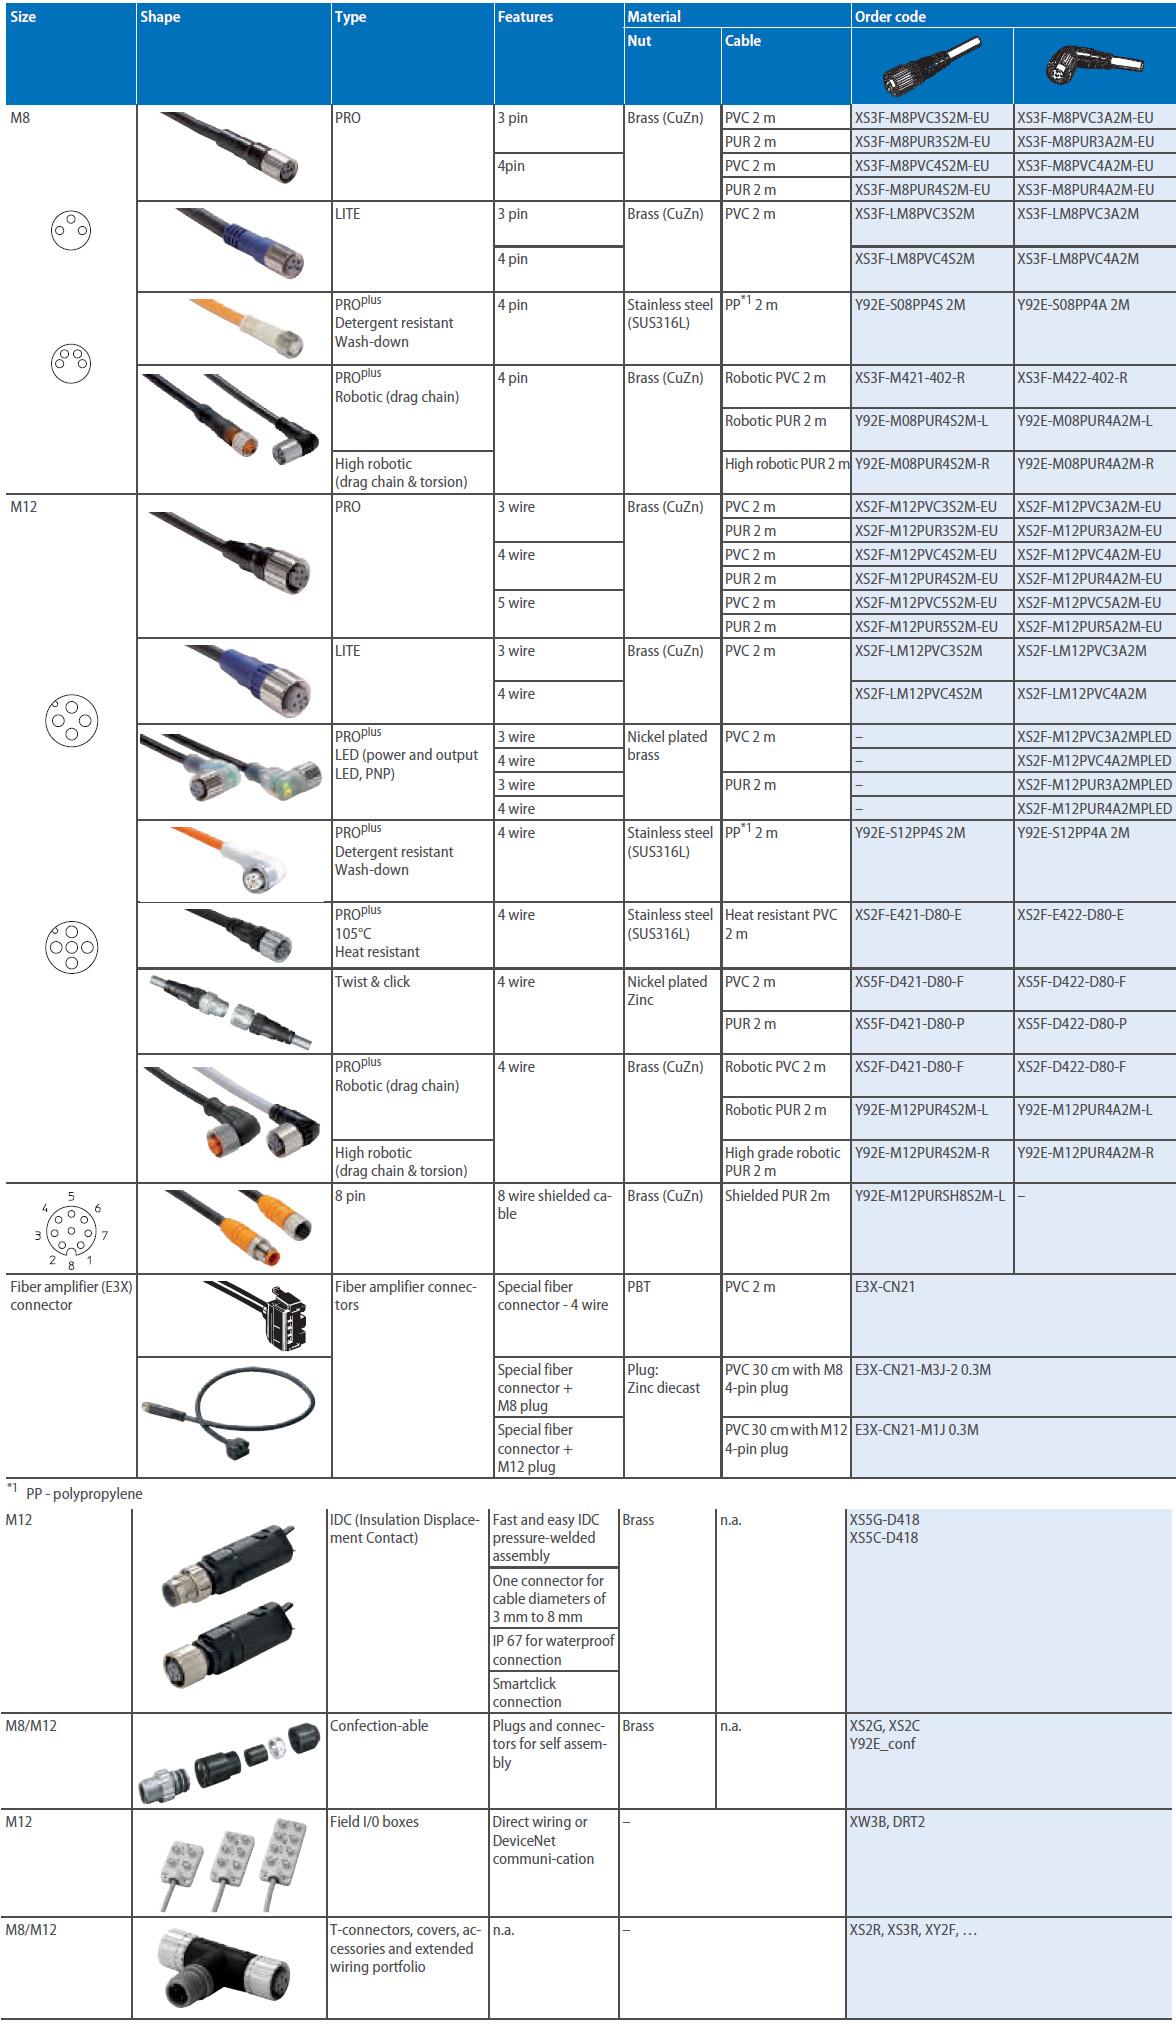 Amplifiers_Accessories_02.jpg